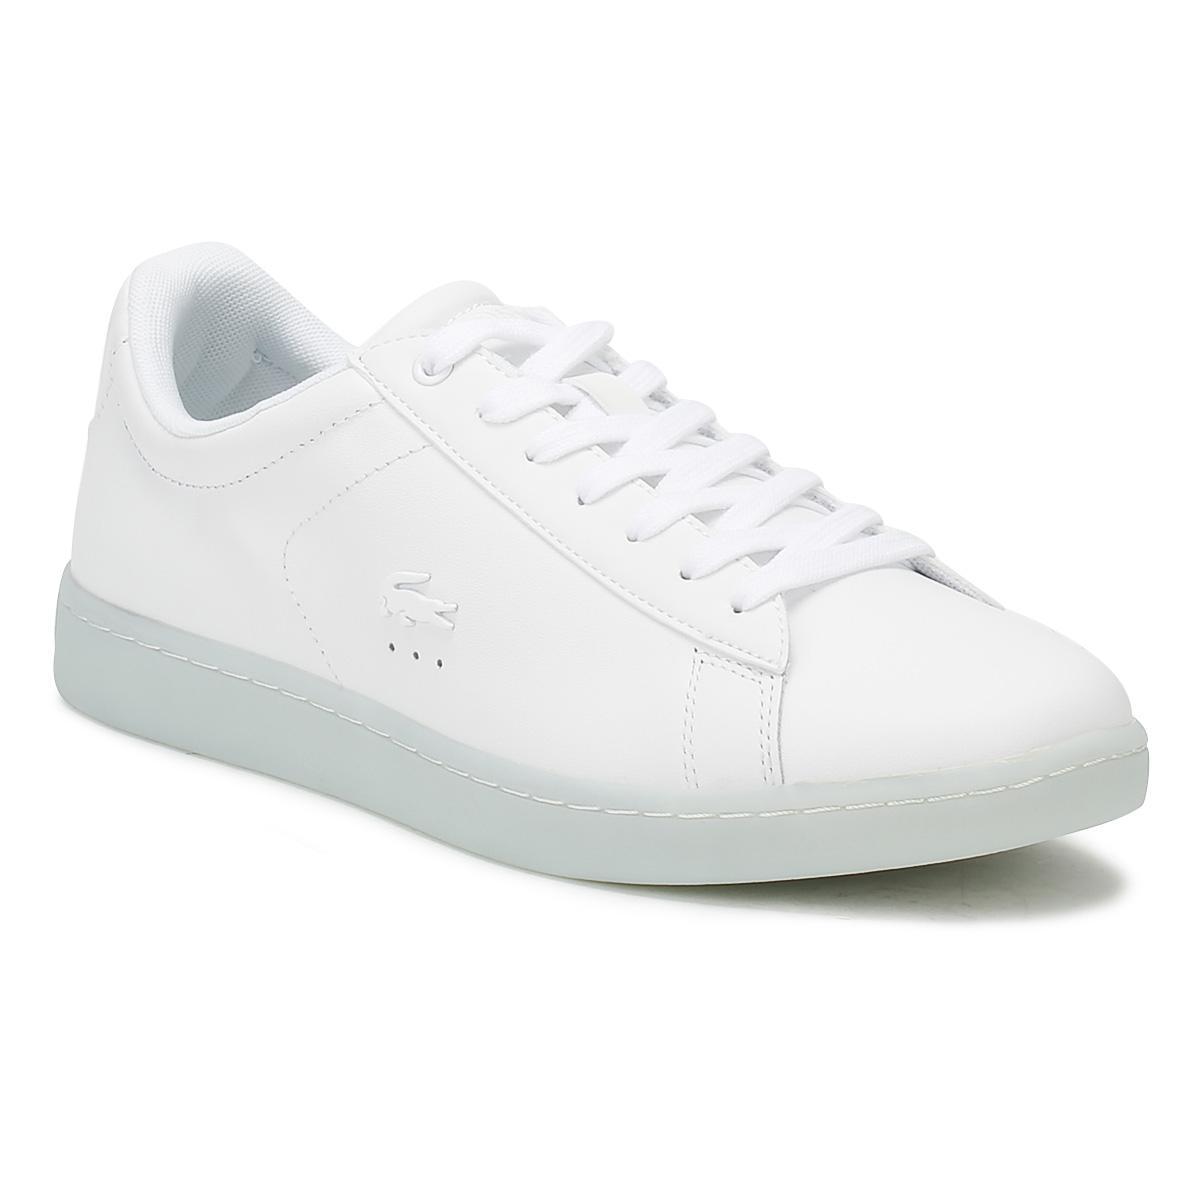 Günstigsten Preis CARNABY EVO - Sneaker low - white/light tan Niedrige Versandgebühr Online Versand Rabatt Verkauf Tv7bdN